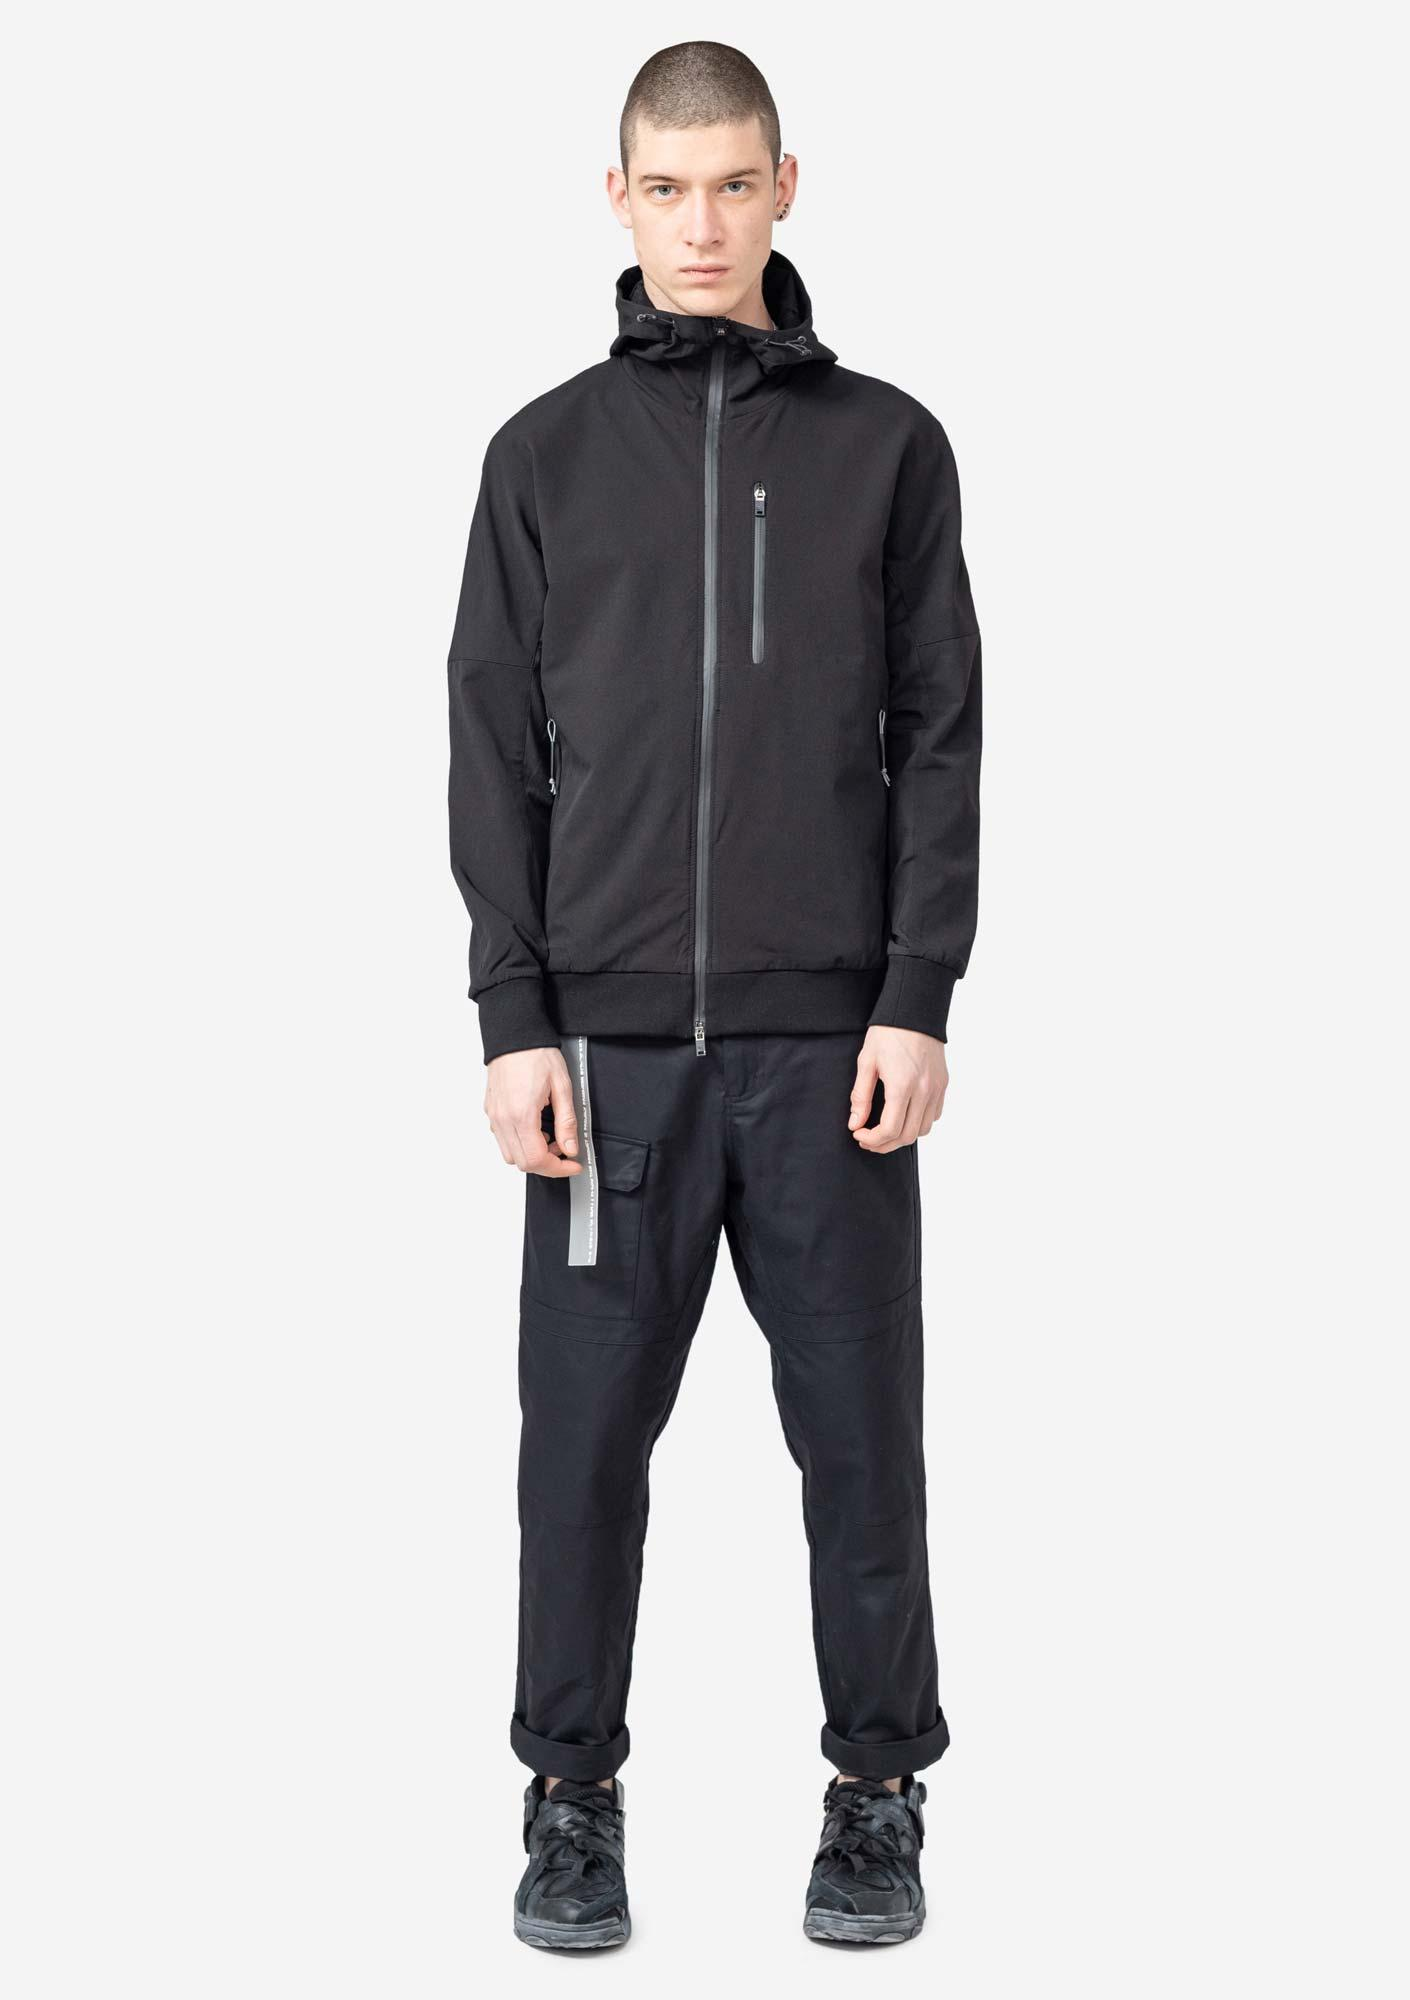 Эластичная куртка с капюшоном  KRAKATAU F50/1